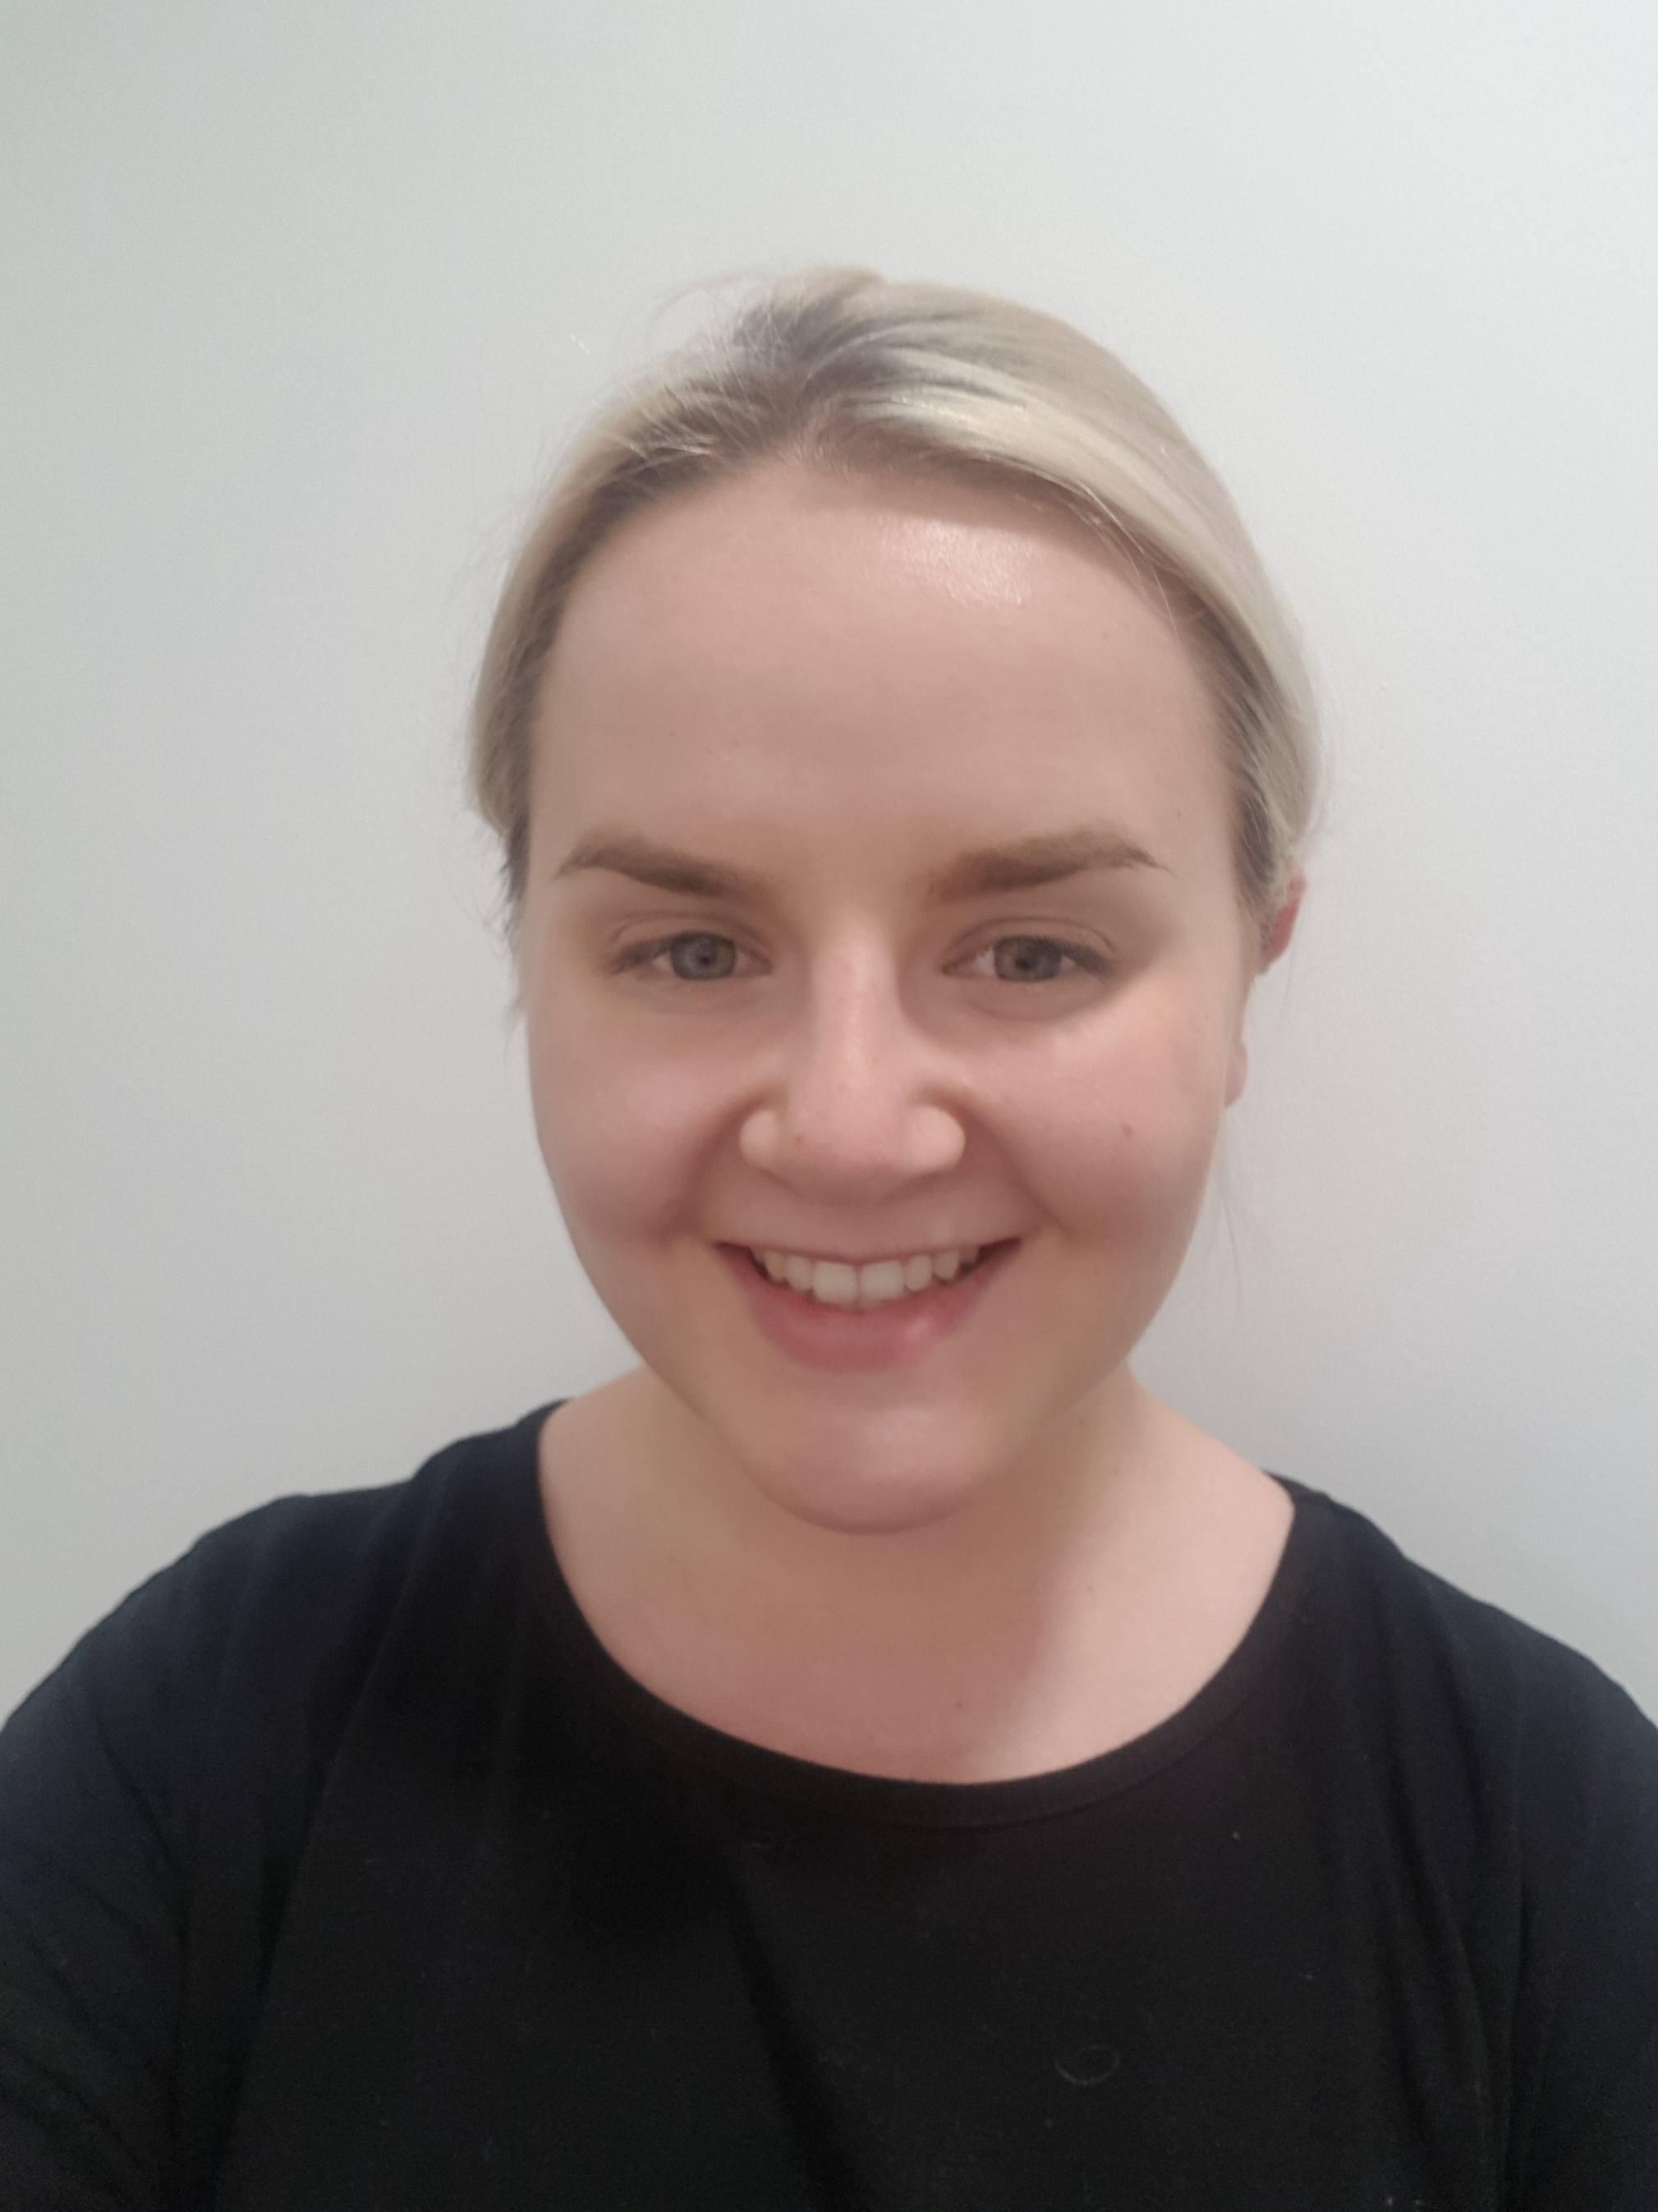 Profile picture of Emma Fife